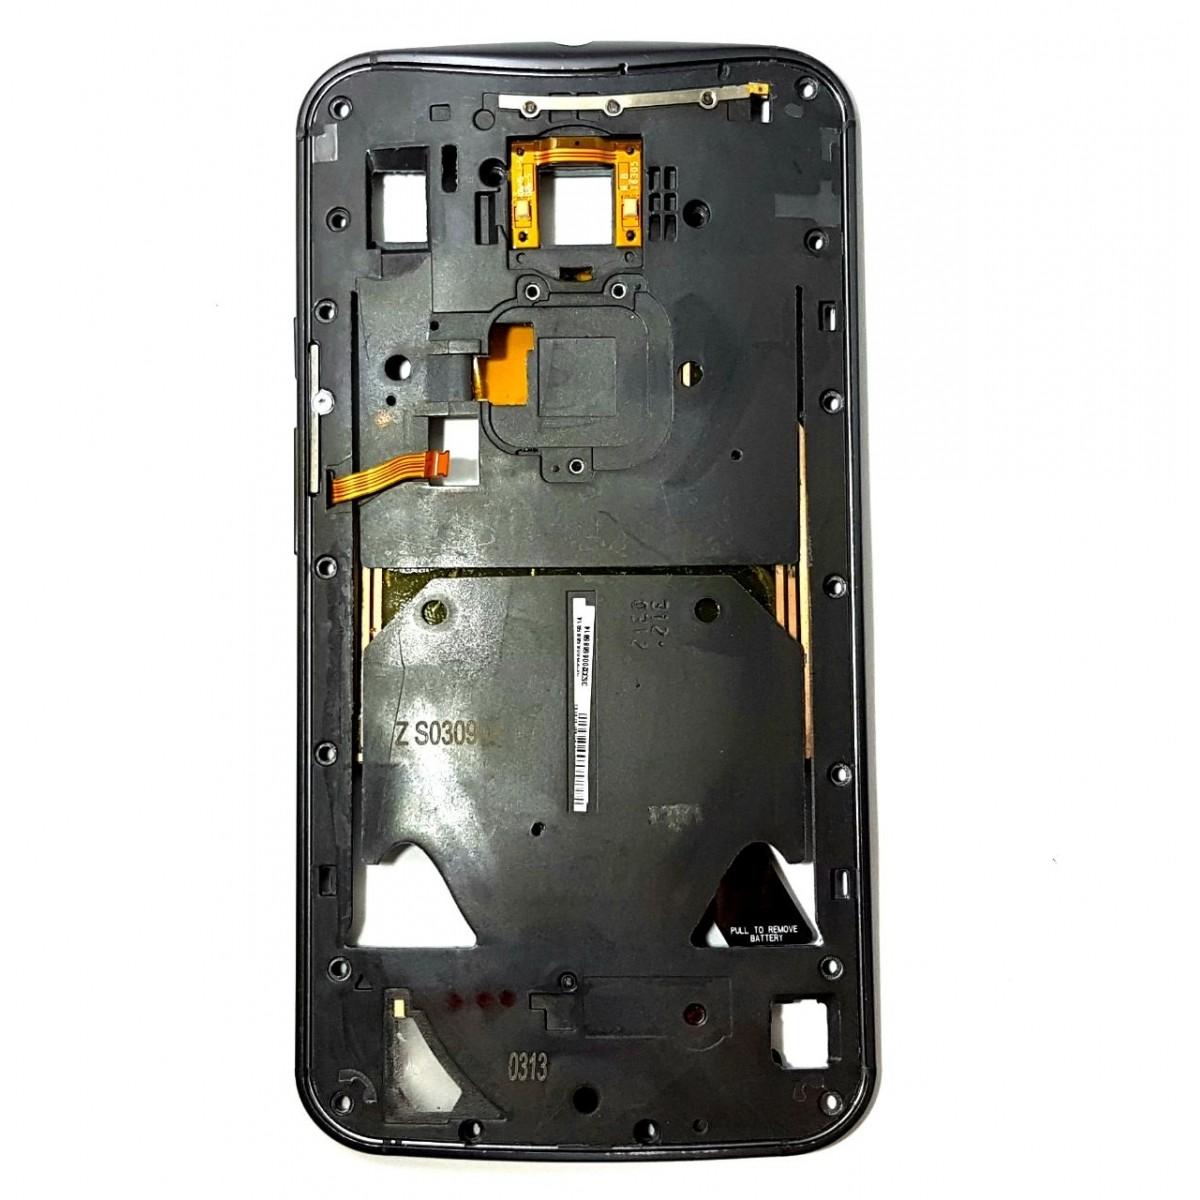 Aro Carcaca Lateral Motorola X2 XT1097 Preto